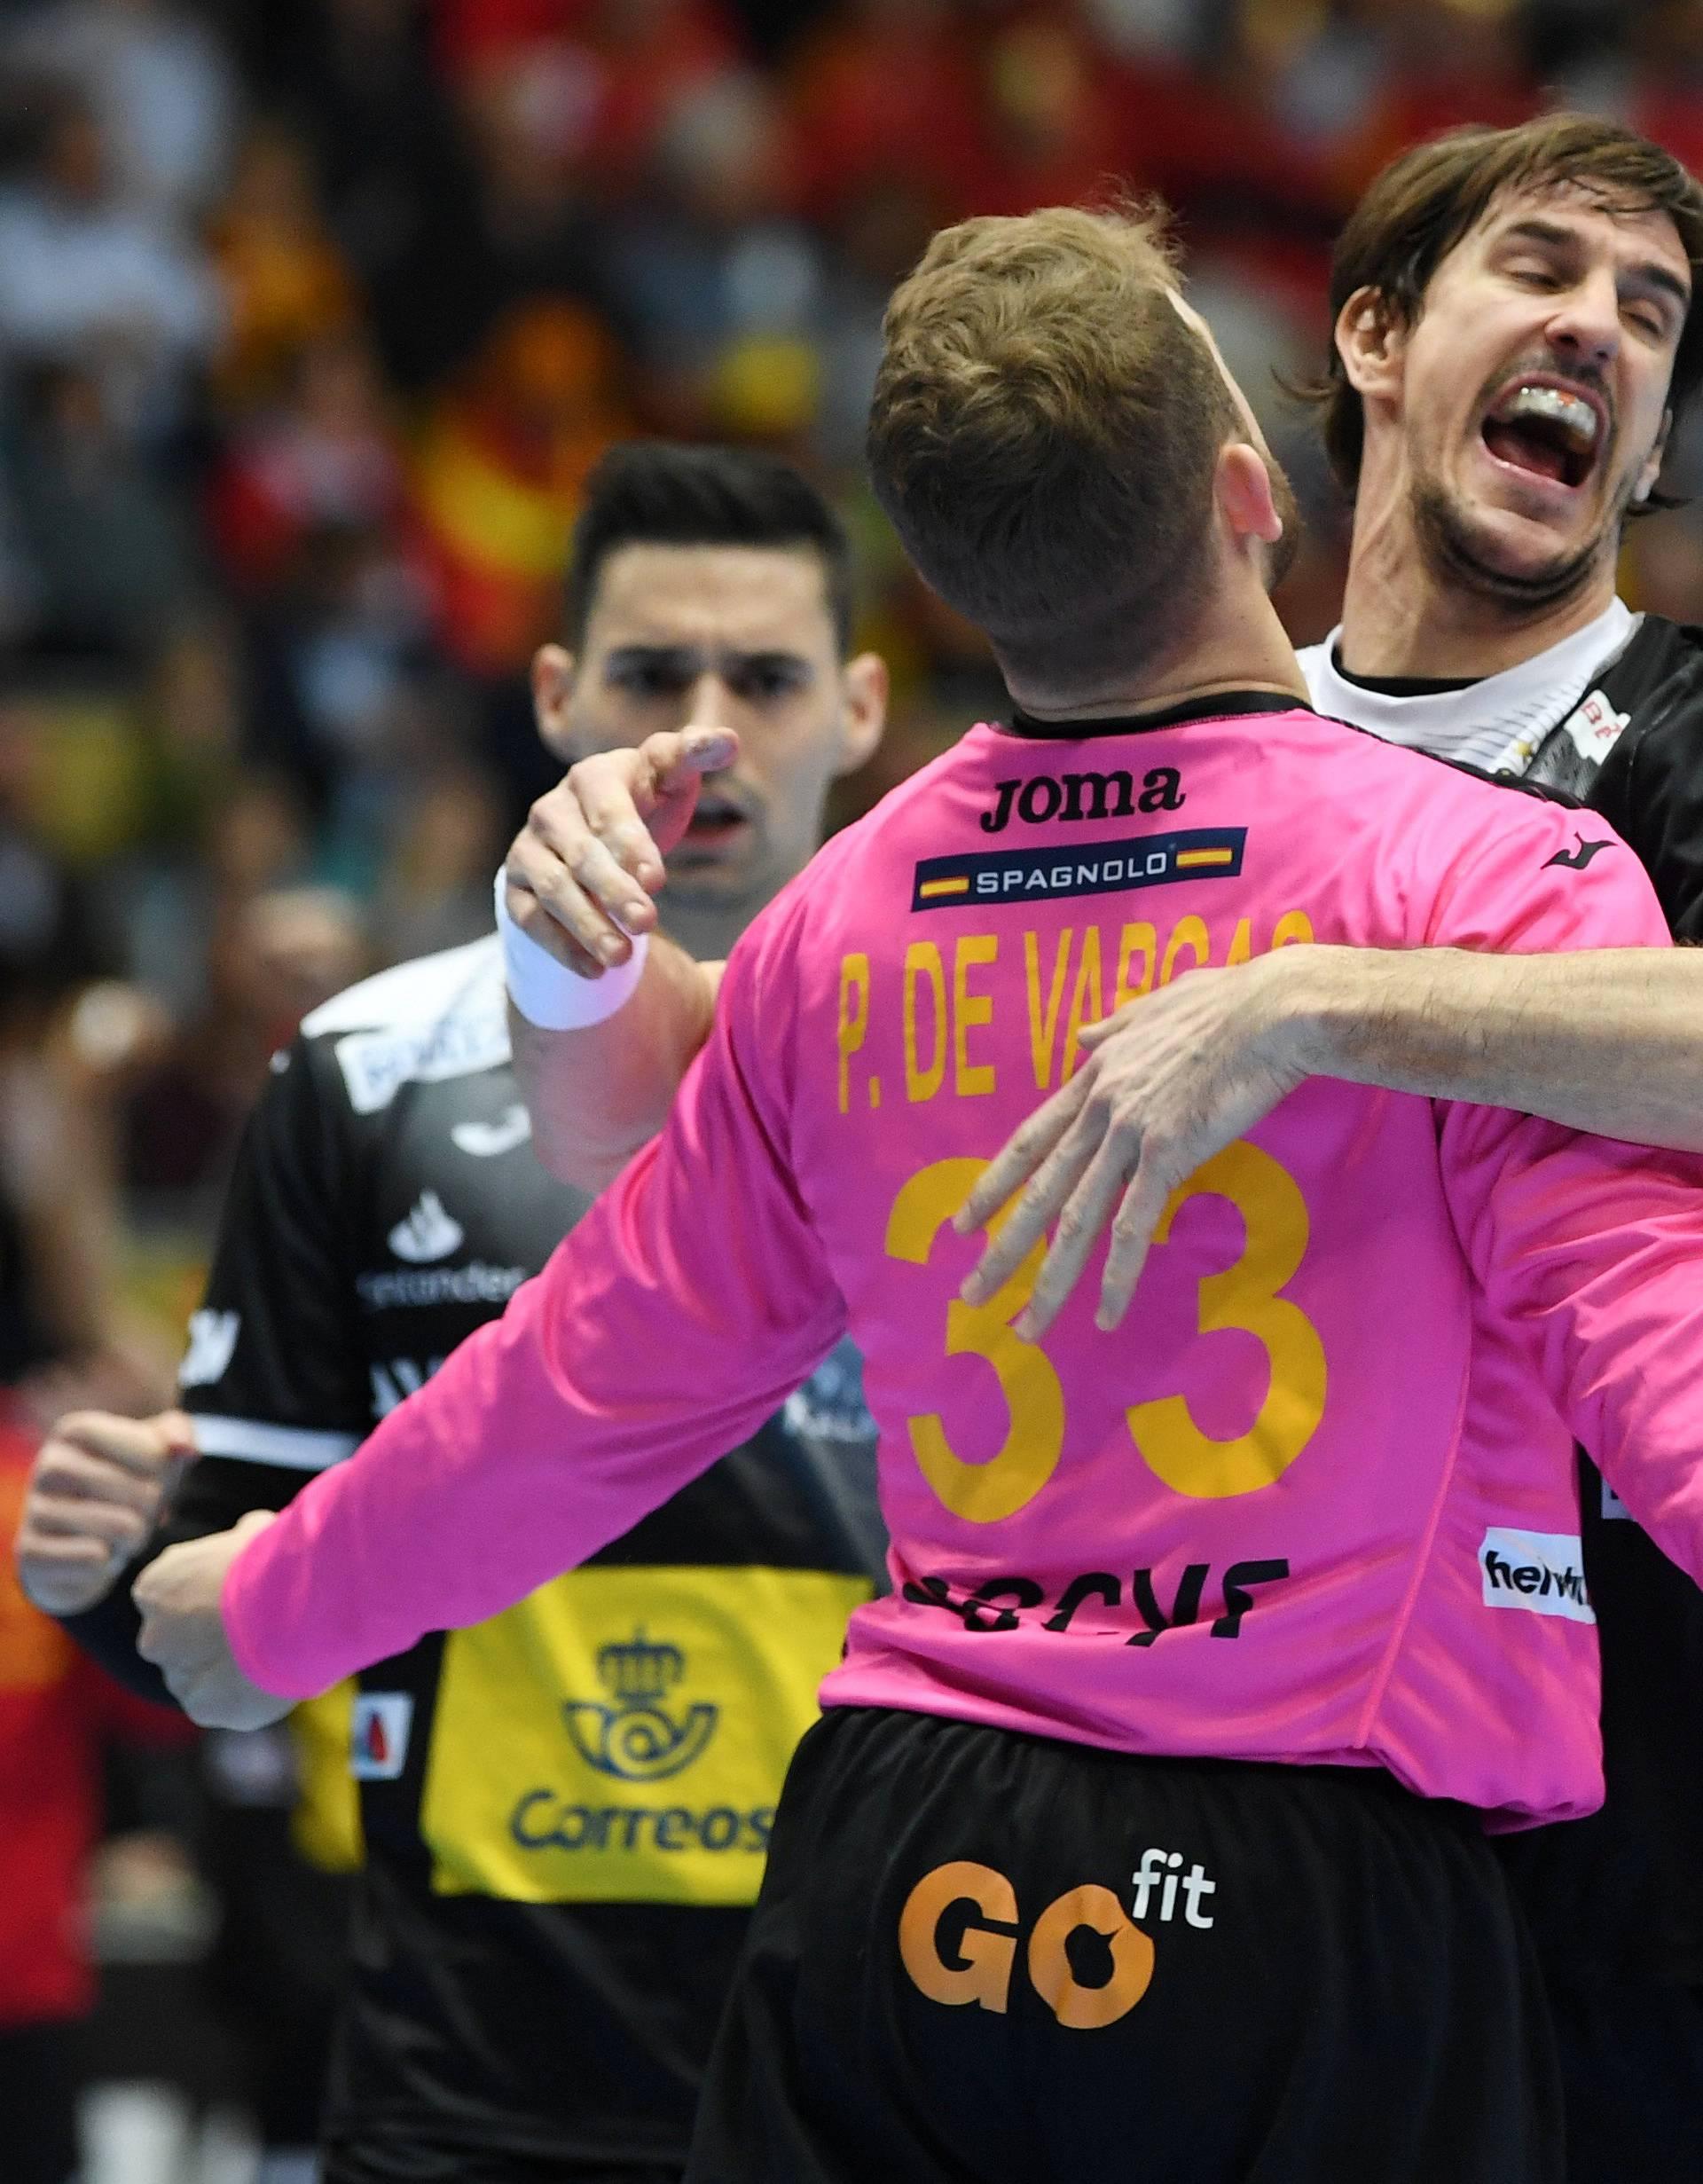 IHF Handball World Championship - Germany & Denmark 2019 - Group B - FYR Macedonia v Spain